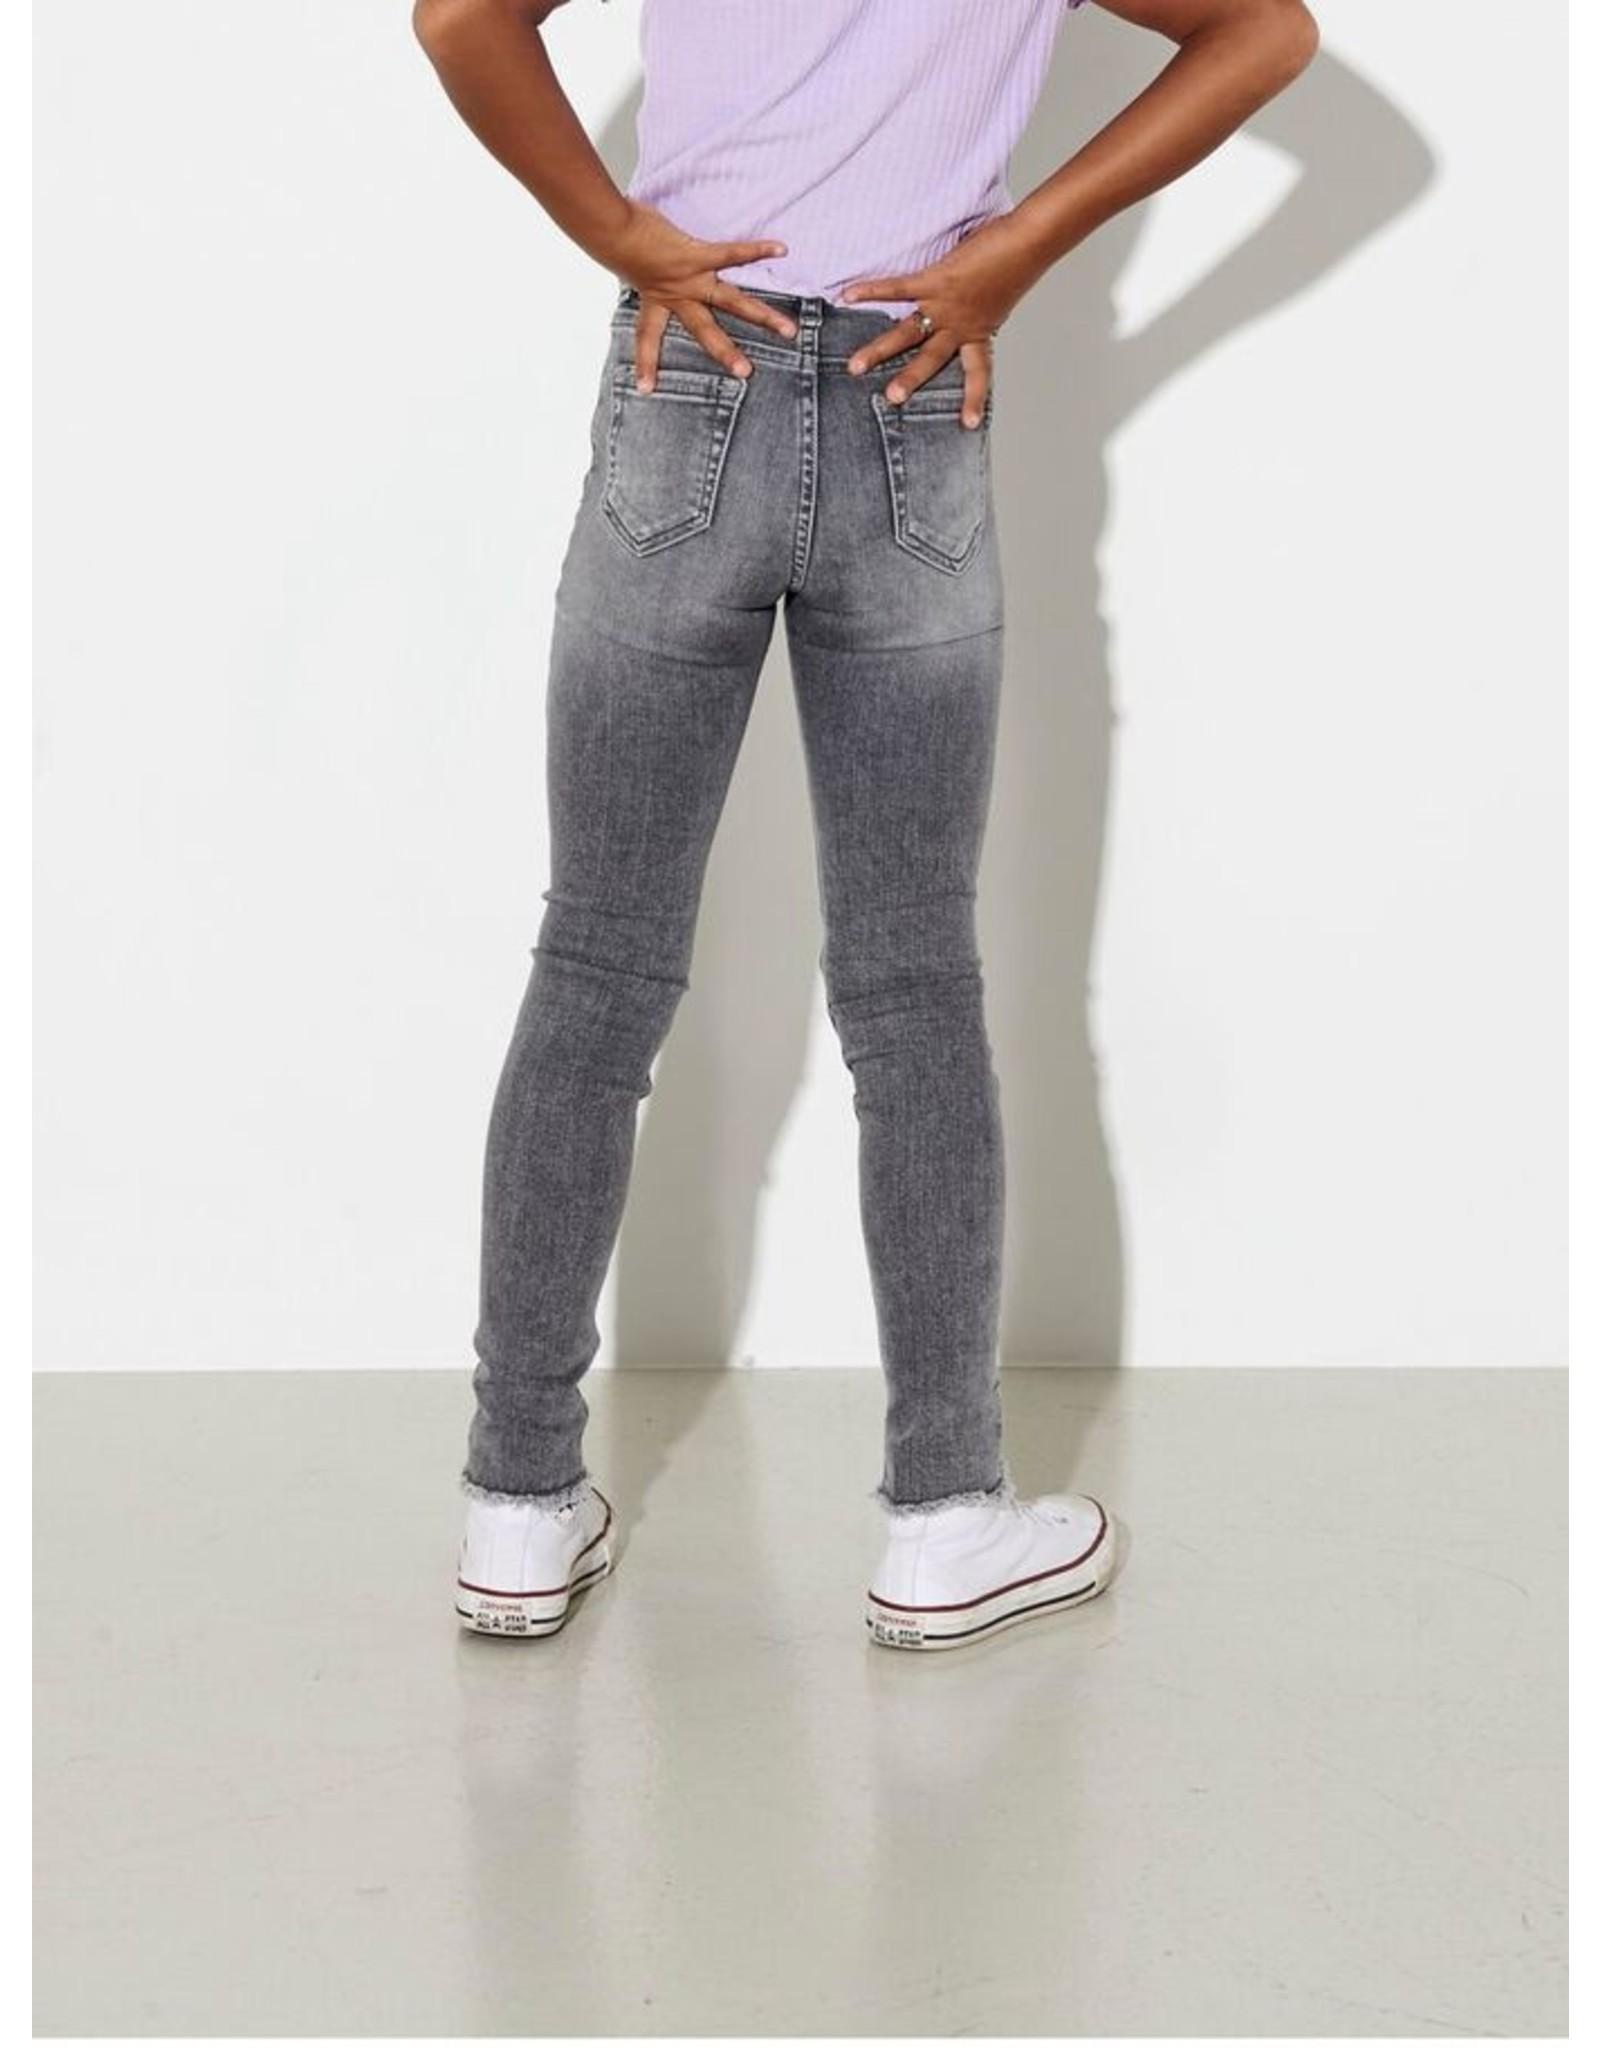 Kids Only Blush Skinny Jeans Grijs